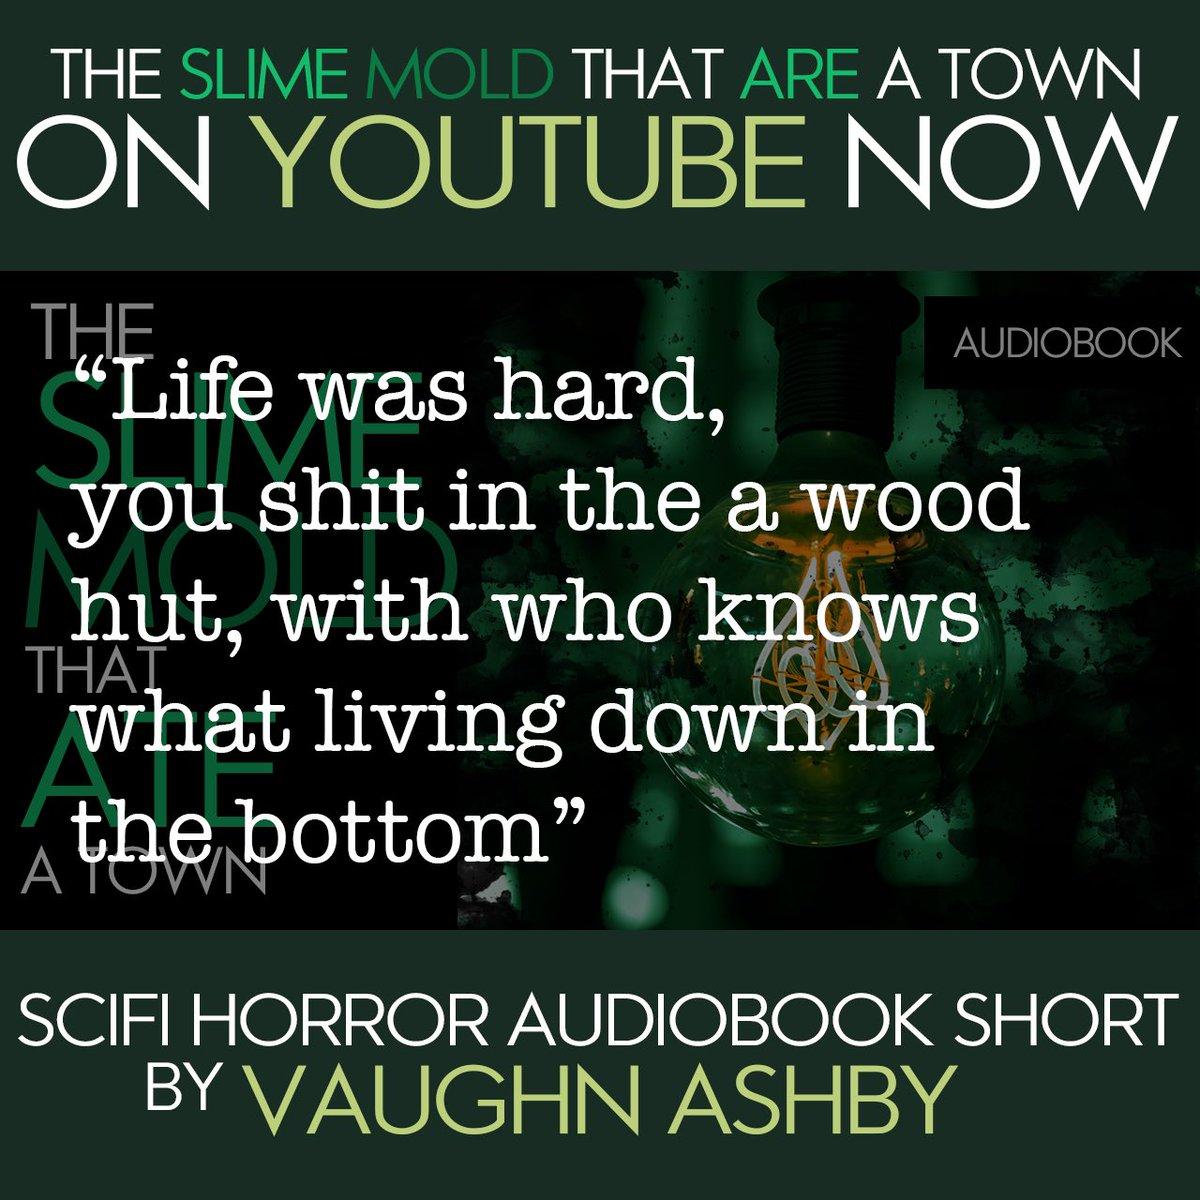 SCI-FI HORROR AUDIOBOOK SHORT STORY  https://youtu.be/KNwpq-v0CTw  #Horror#SciFi#DarkComedy #sciencefiction #scifiart  #IndieHorror #horrorjunkie #horrorfanatic  #Audiobook#audiobooks#AudioStory #smalltown #mountainlife #mountainstories #coalmining #coaltownpic.twitter.com/XDIAvizqcm